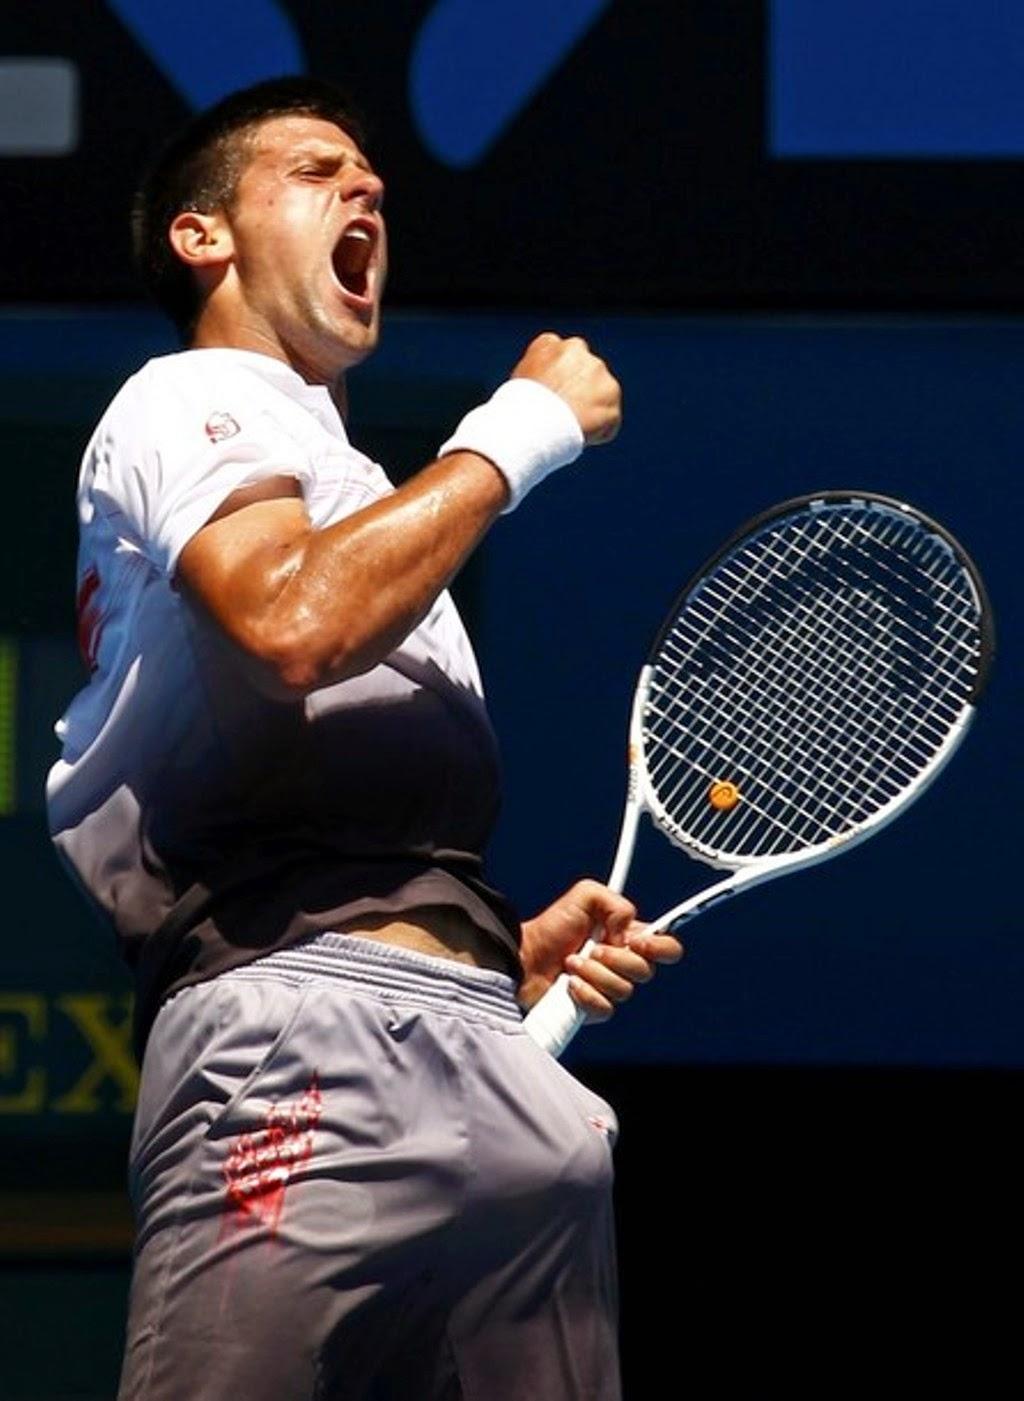 tenista mas famoso: